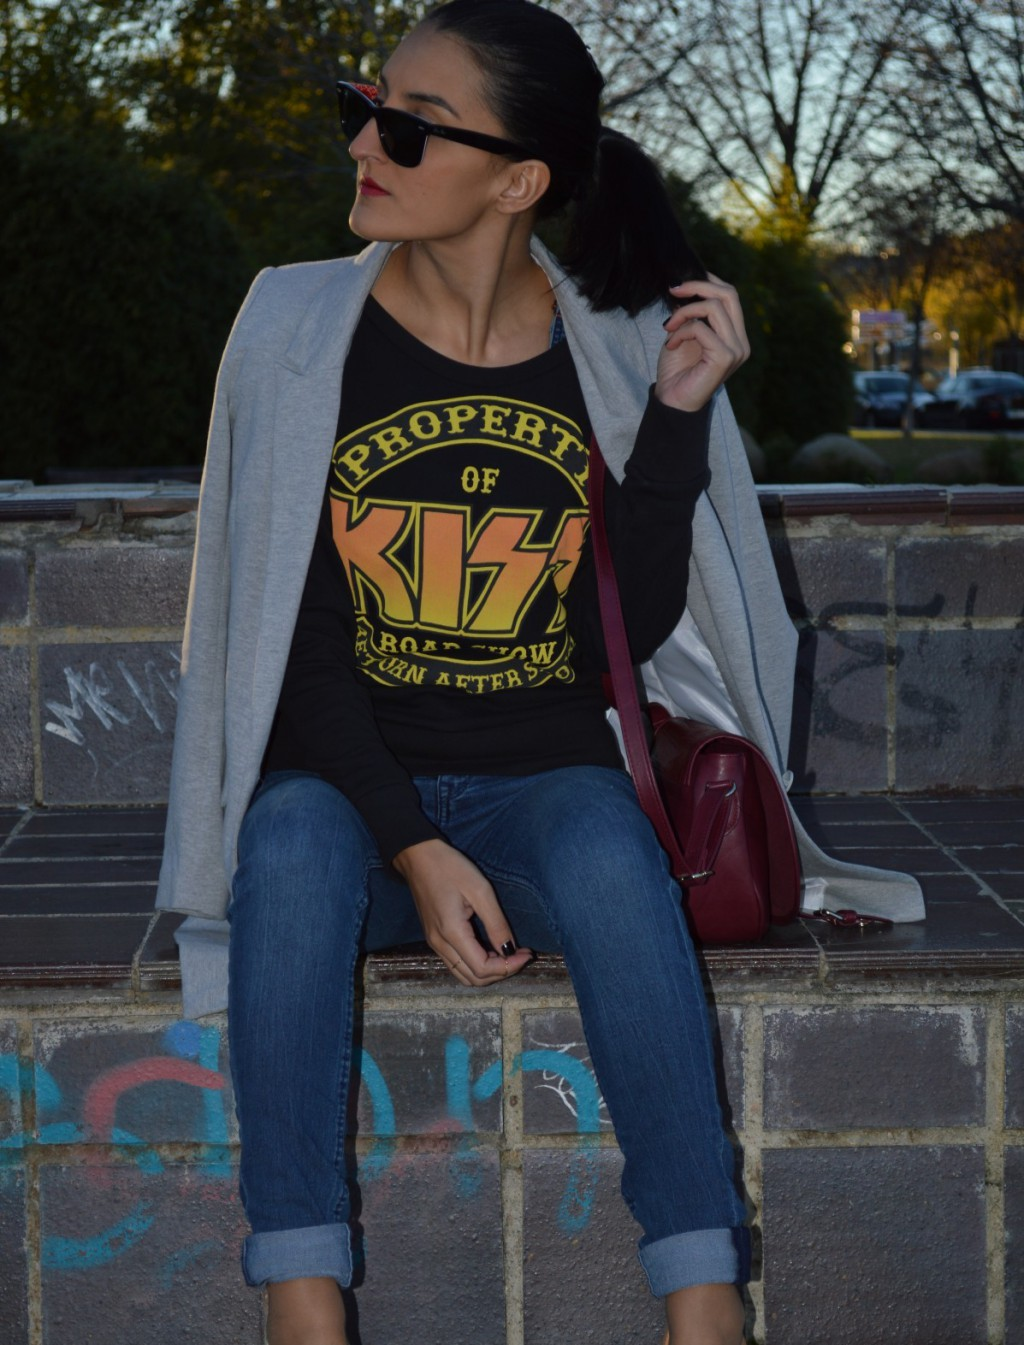 Sudadera / sweatshirt: H&M Jeans: H&M Blazer: Stradivarius Stilettos: Zara Bolso / bag: Bershka Anillos: rings: H&M Esmalte de uñas / nail polish: KiKo